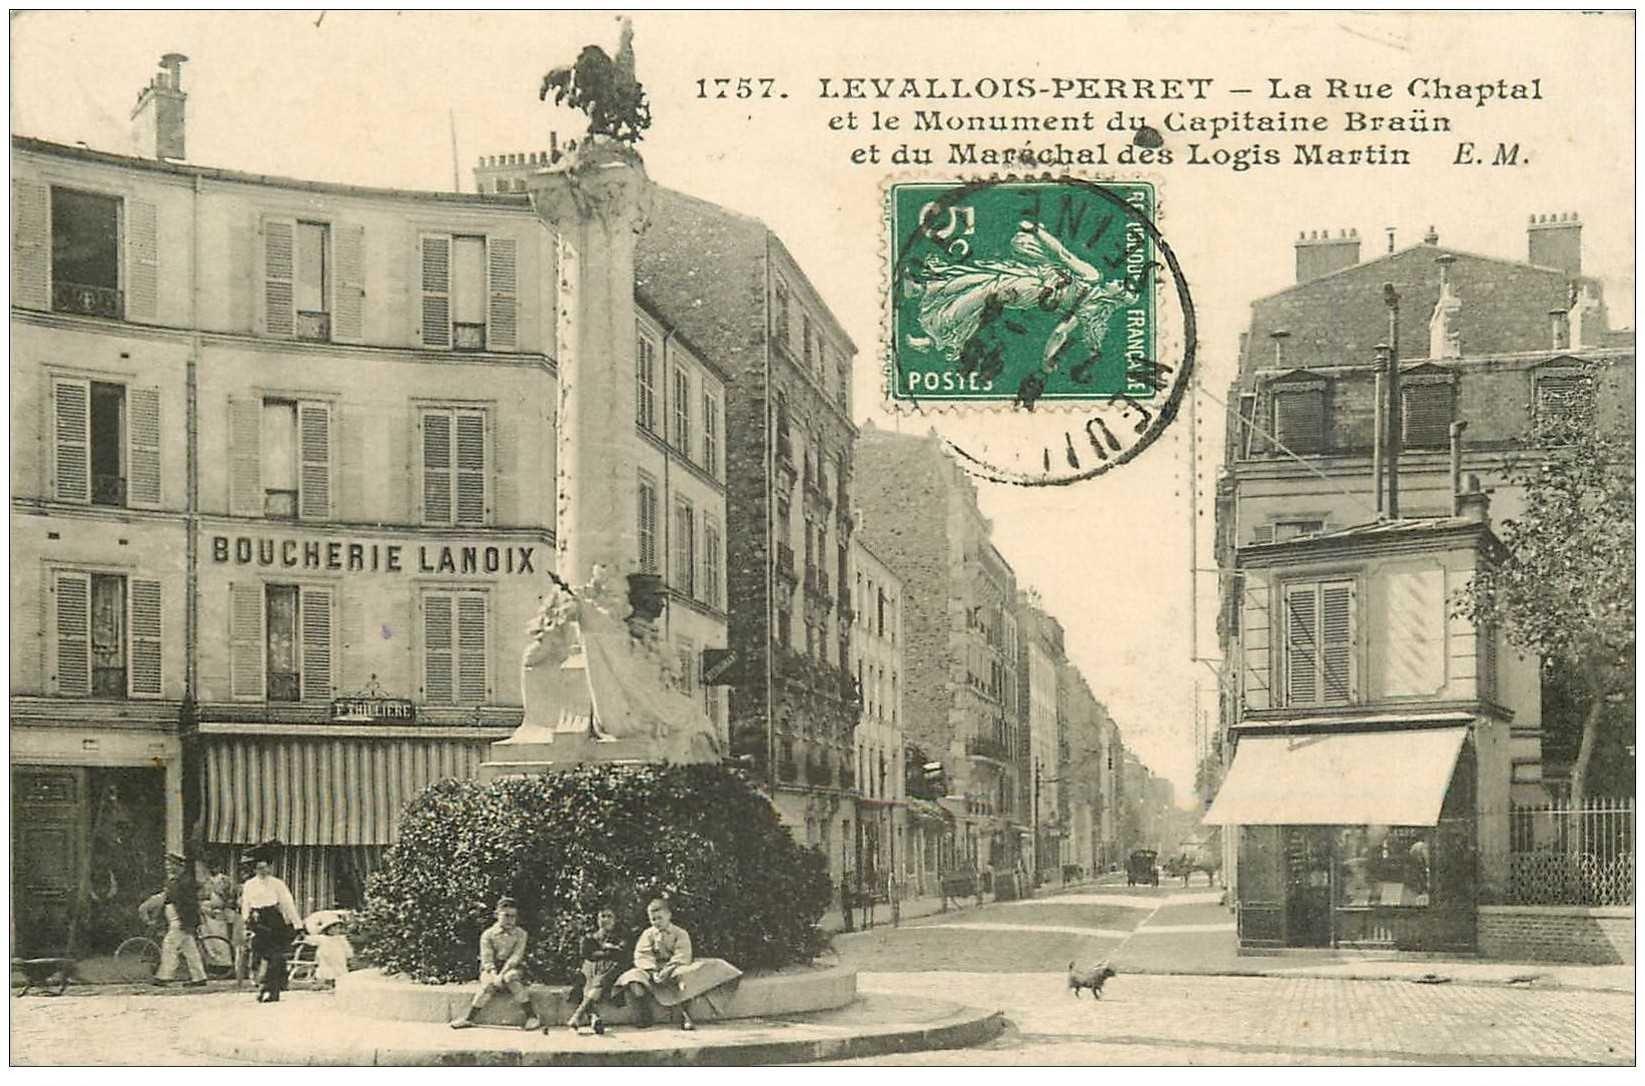 92 levallois perret boucherie lanoix rue chaptal 1912. Black Bedroom Furniture Sets. Home Design Ideas